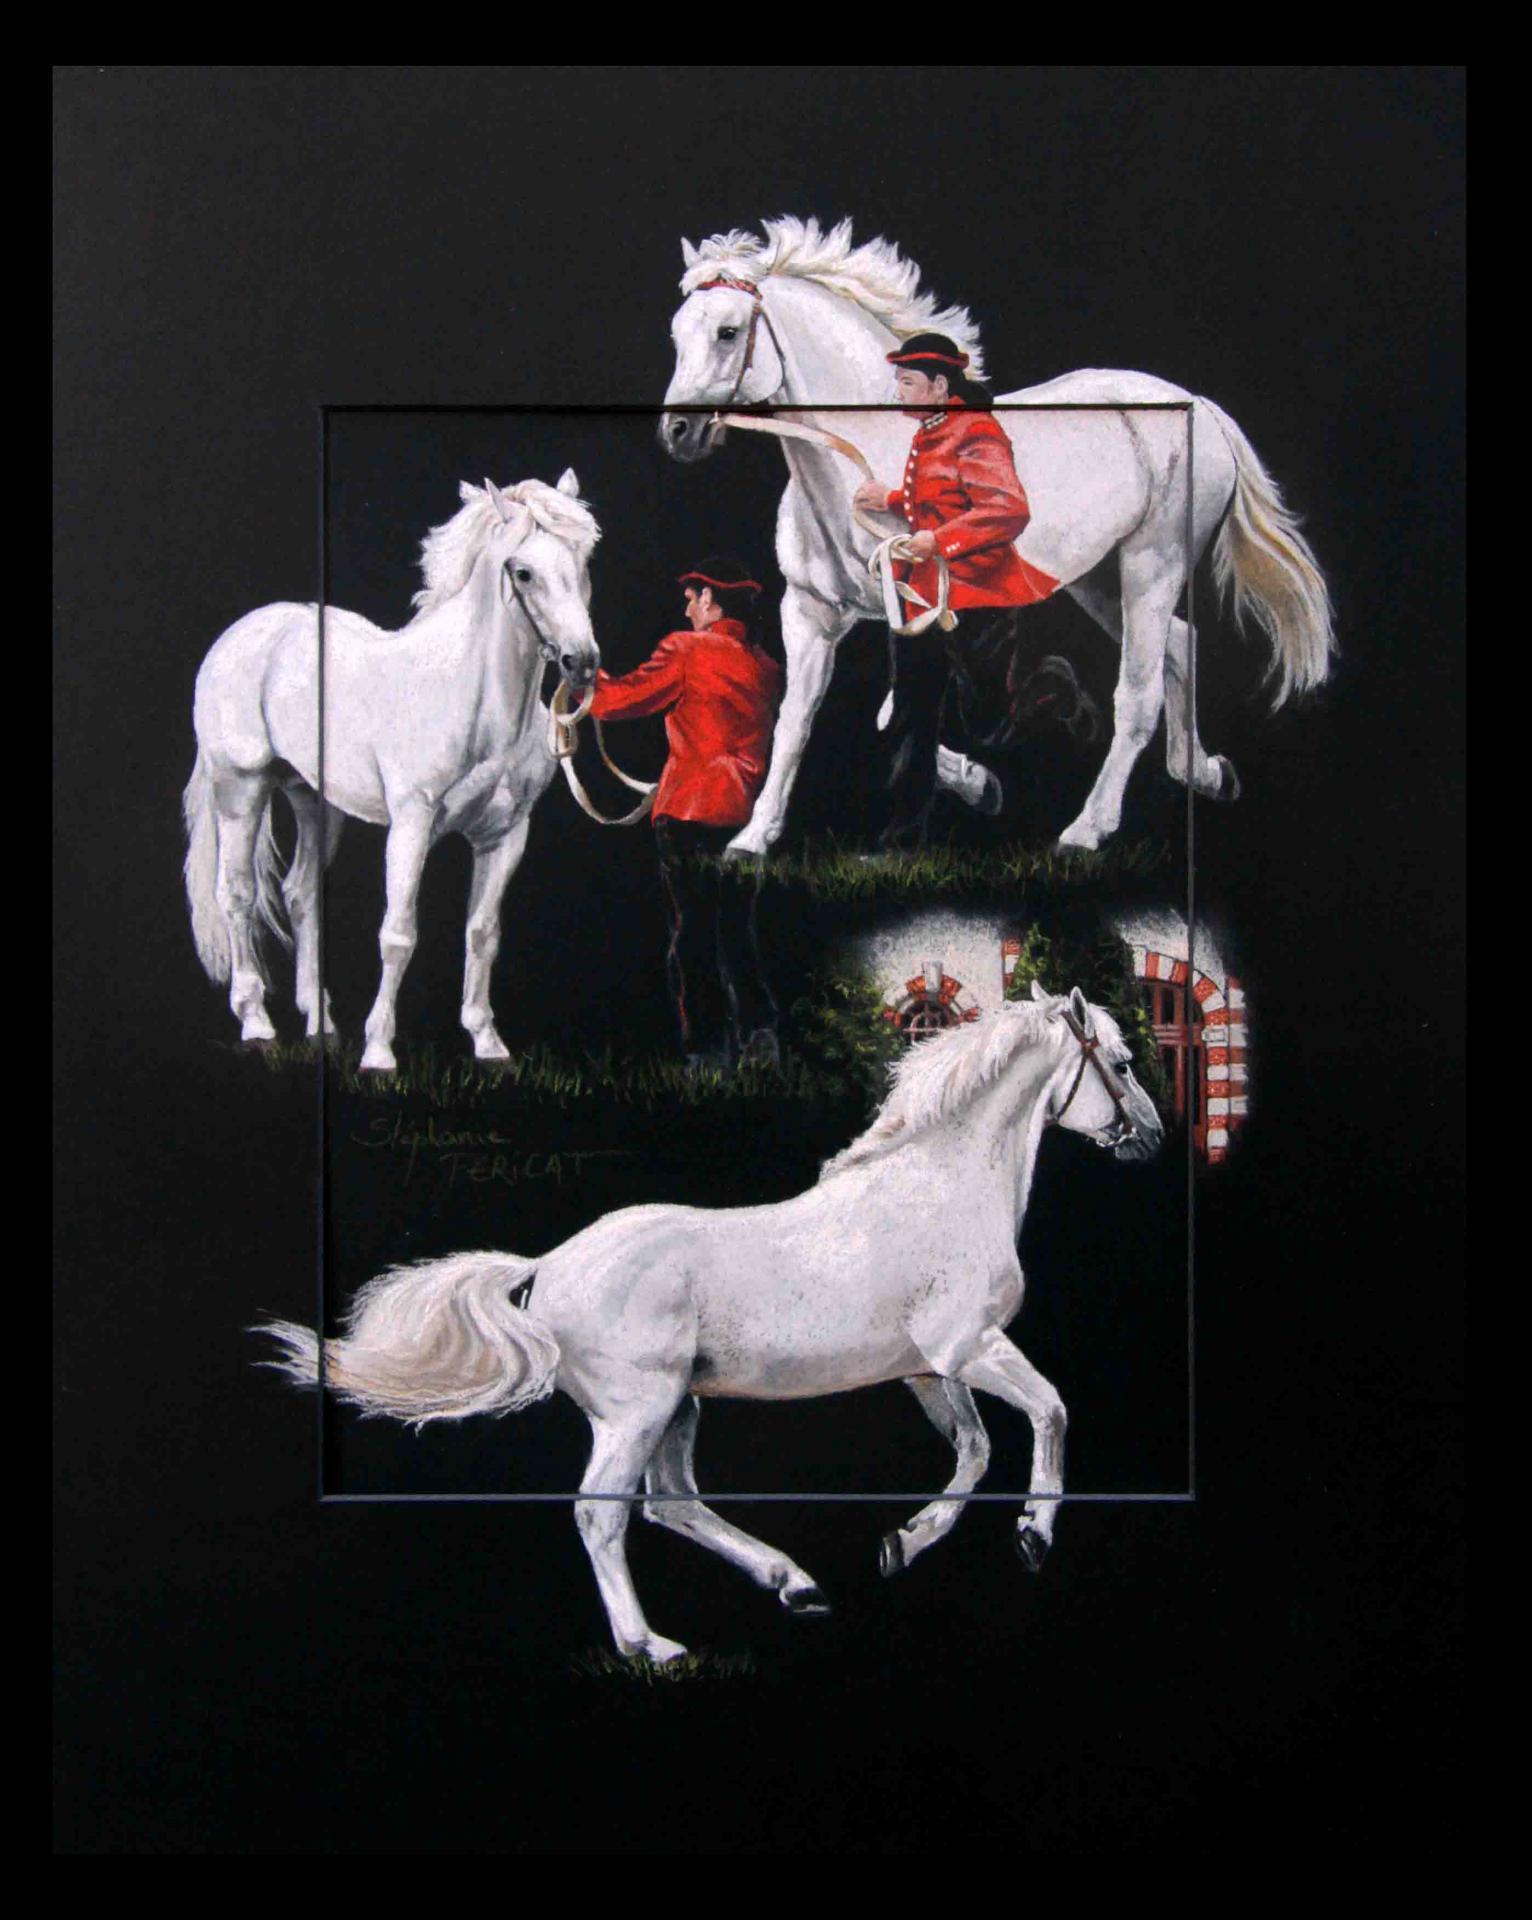 CYRANO PONDI, étalon national connemara - pastel sec(soft pastel) - 40x50cm